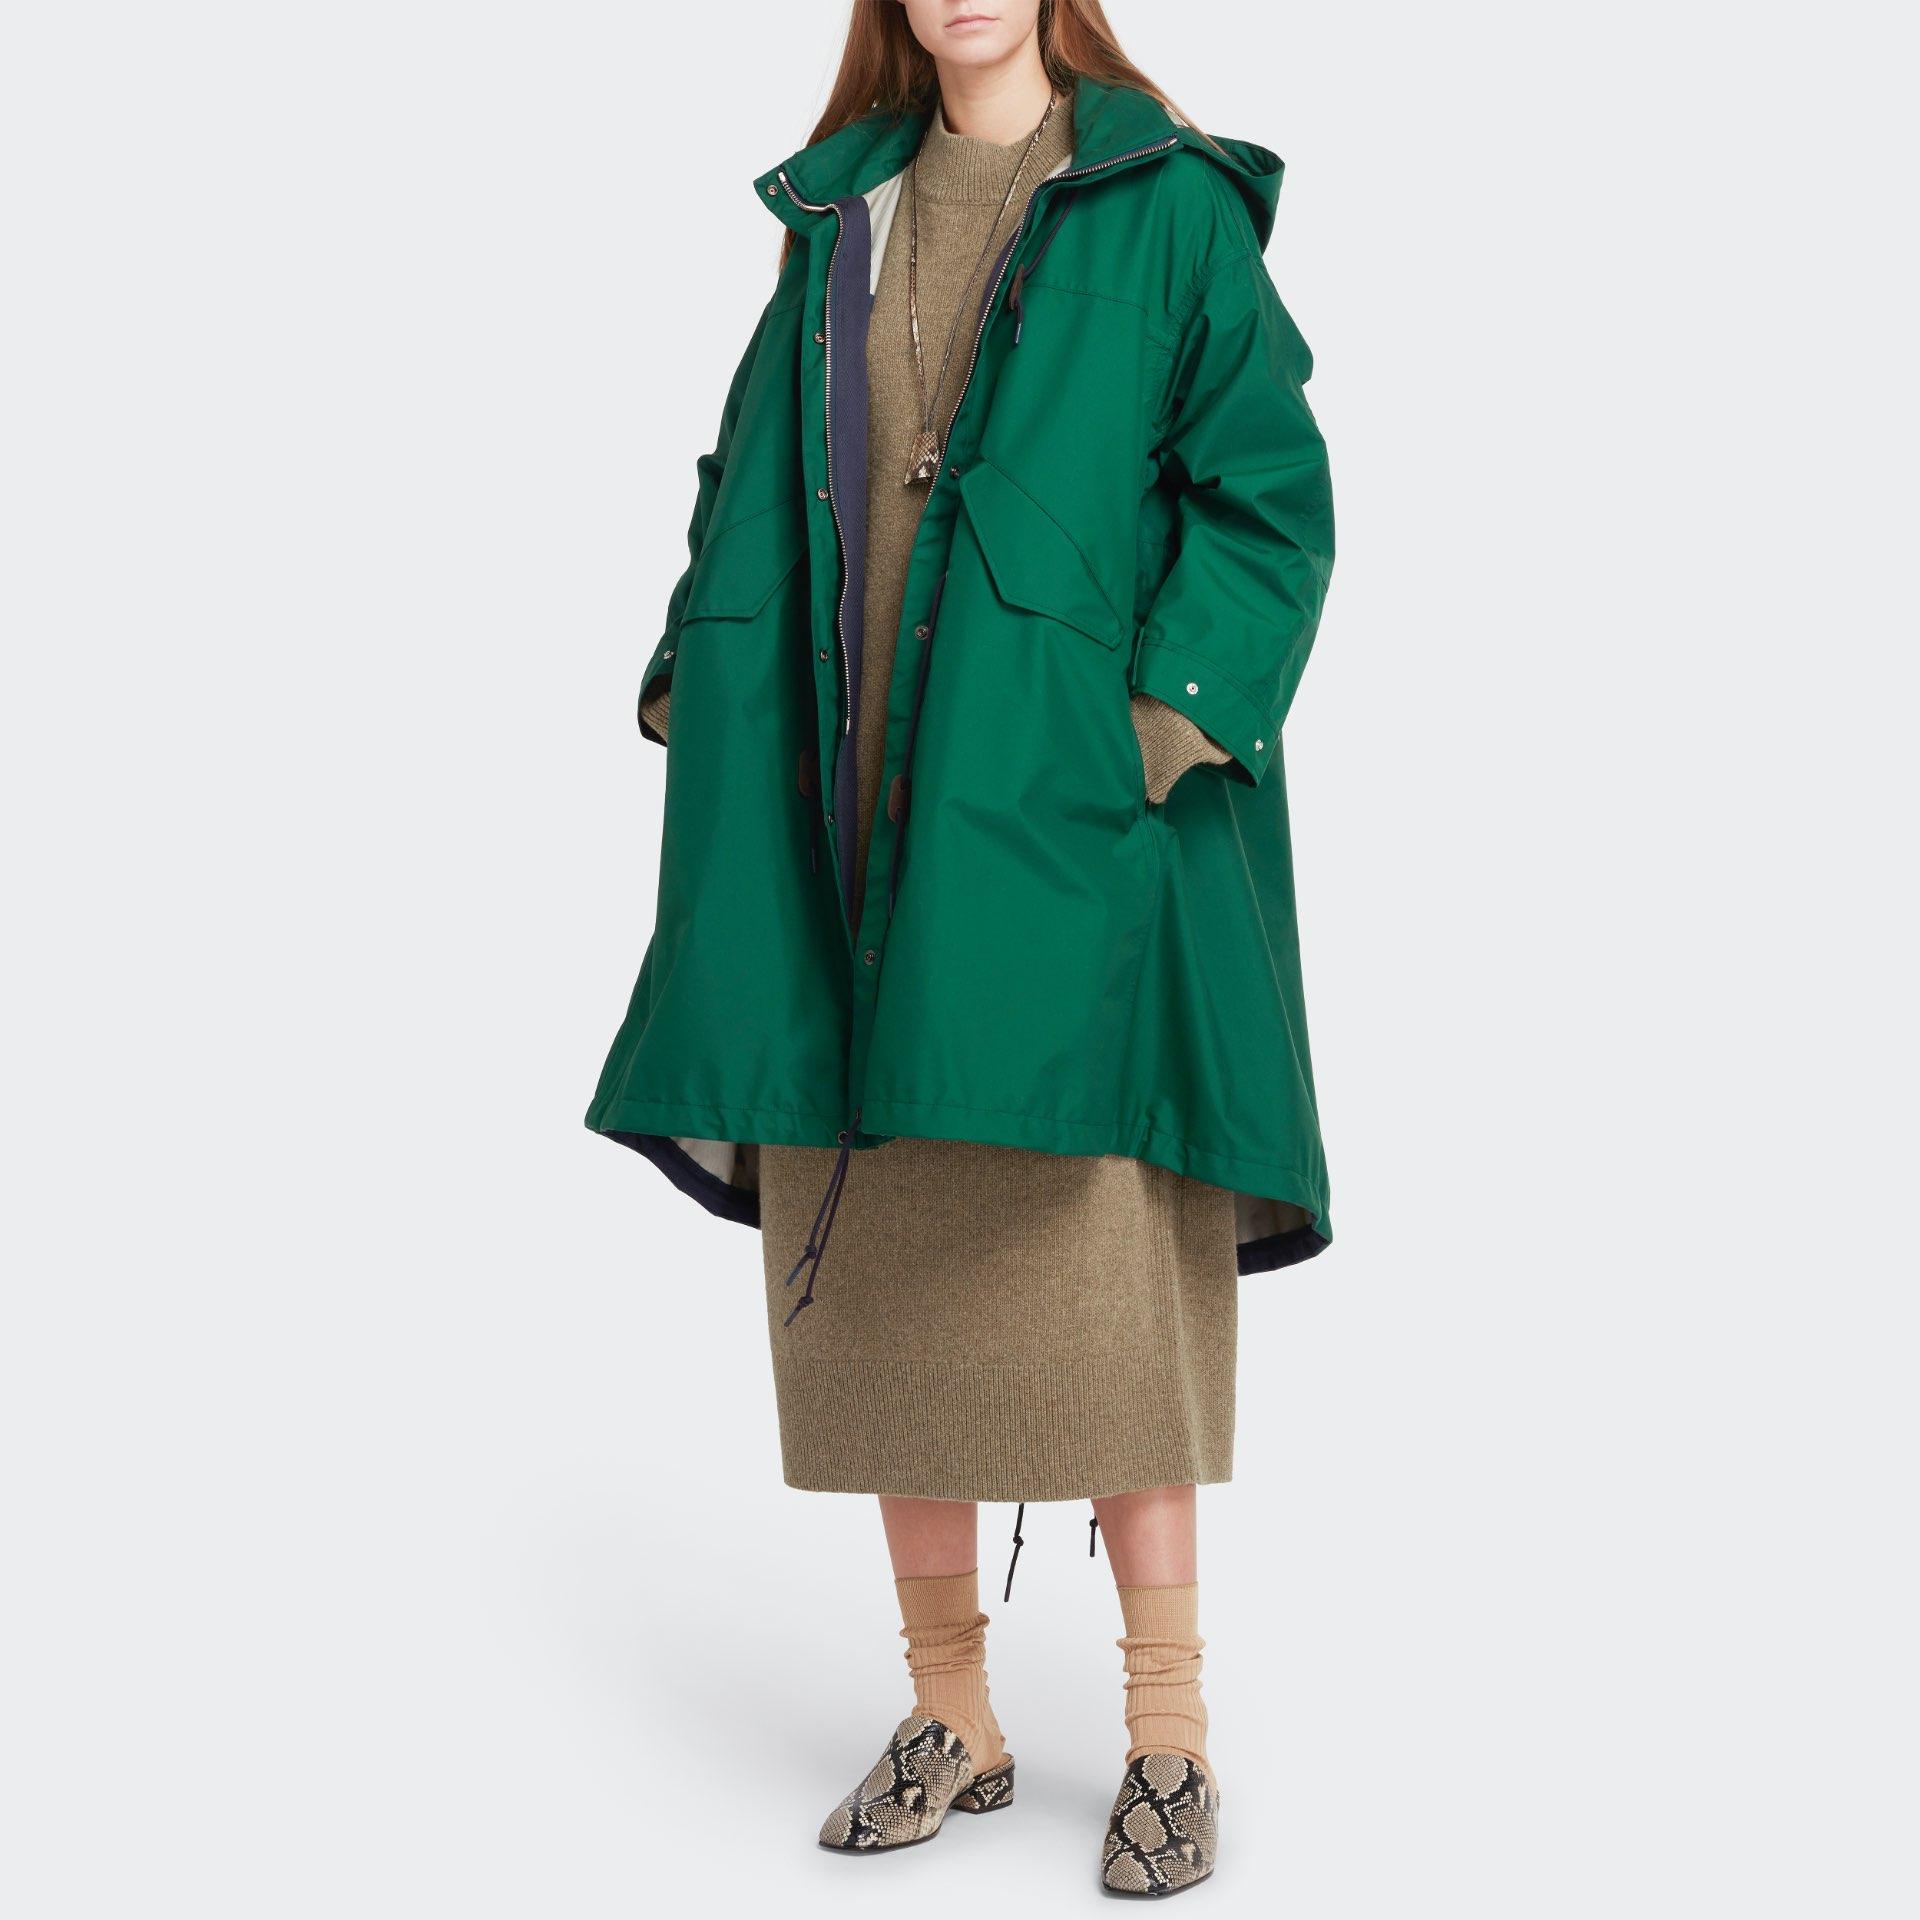 Womenswear model wearing pale moss long sweater dress with a deep green raincoat over her